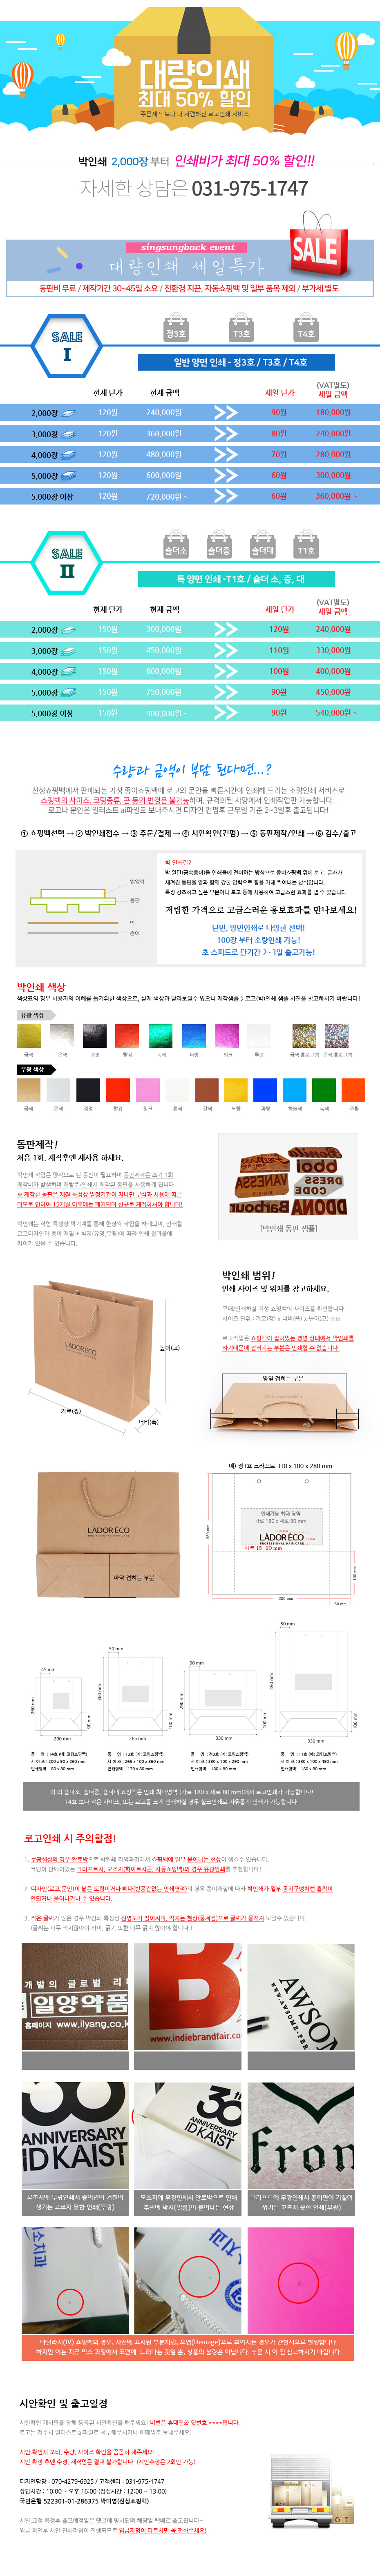 print_guide02.jpg